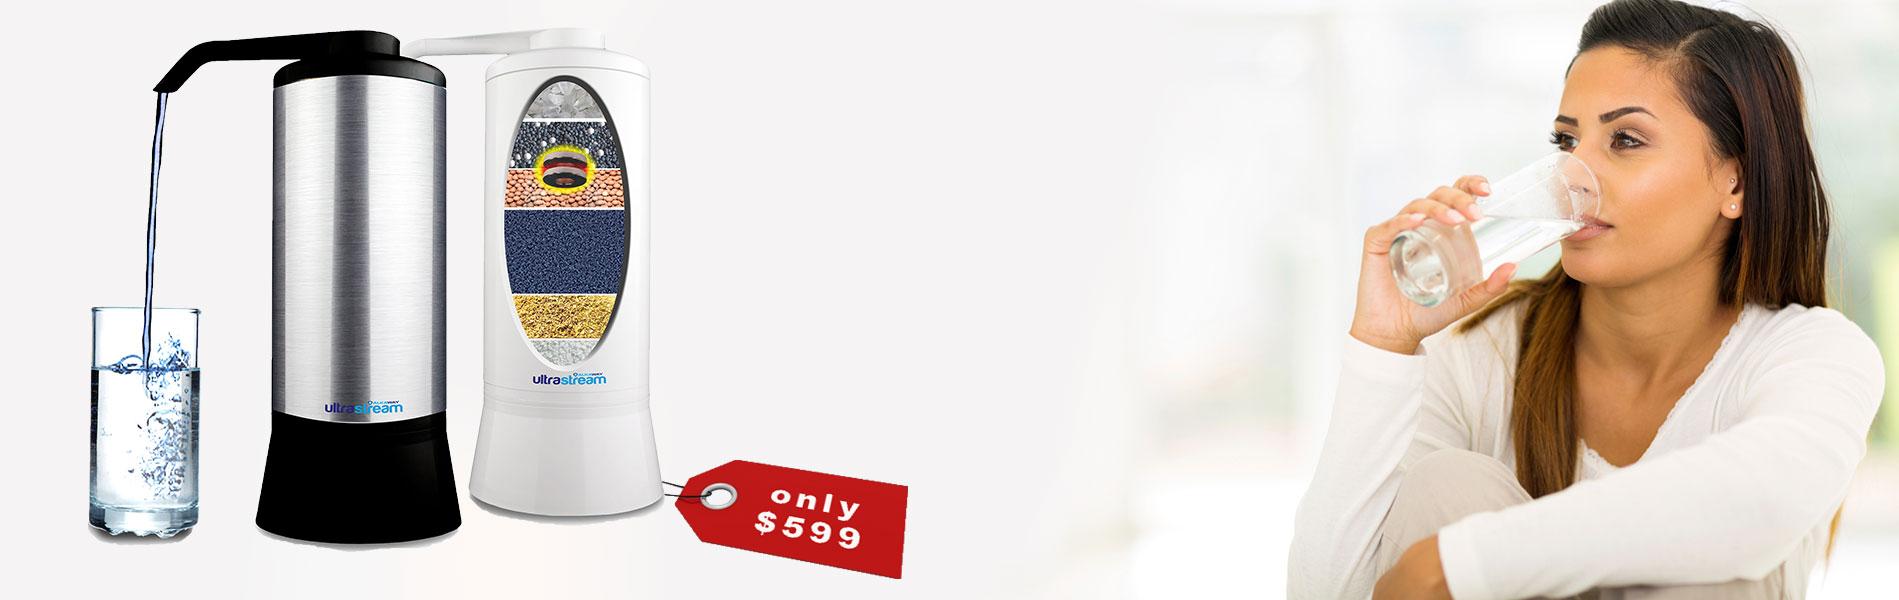 ultrastream-sale.jpg